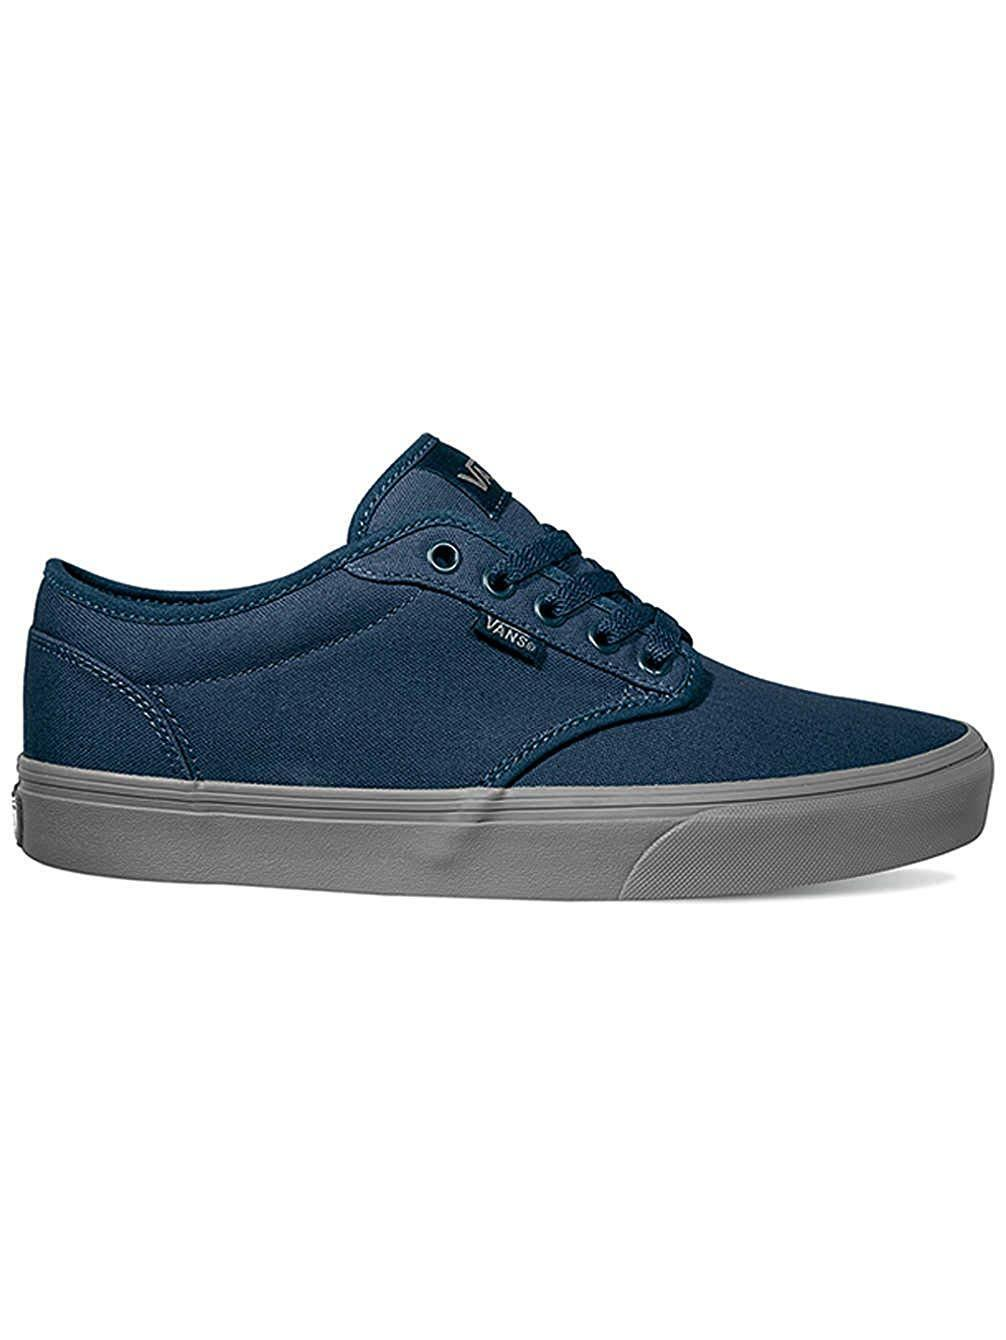 Vans Atwood (Check Liner) Dress Bleu Homme Skate Chaussures 6.5 Femme 8 BleuS NEW NIB